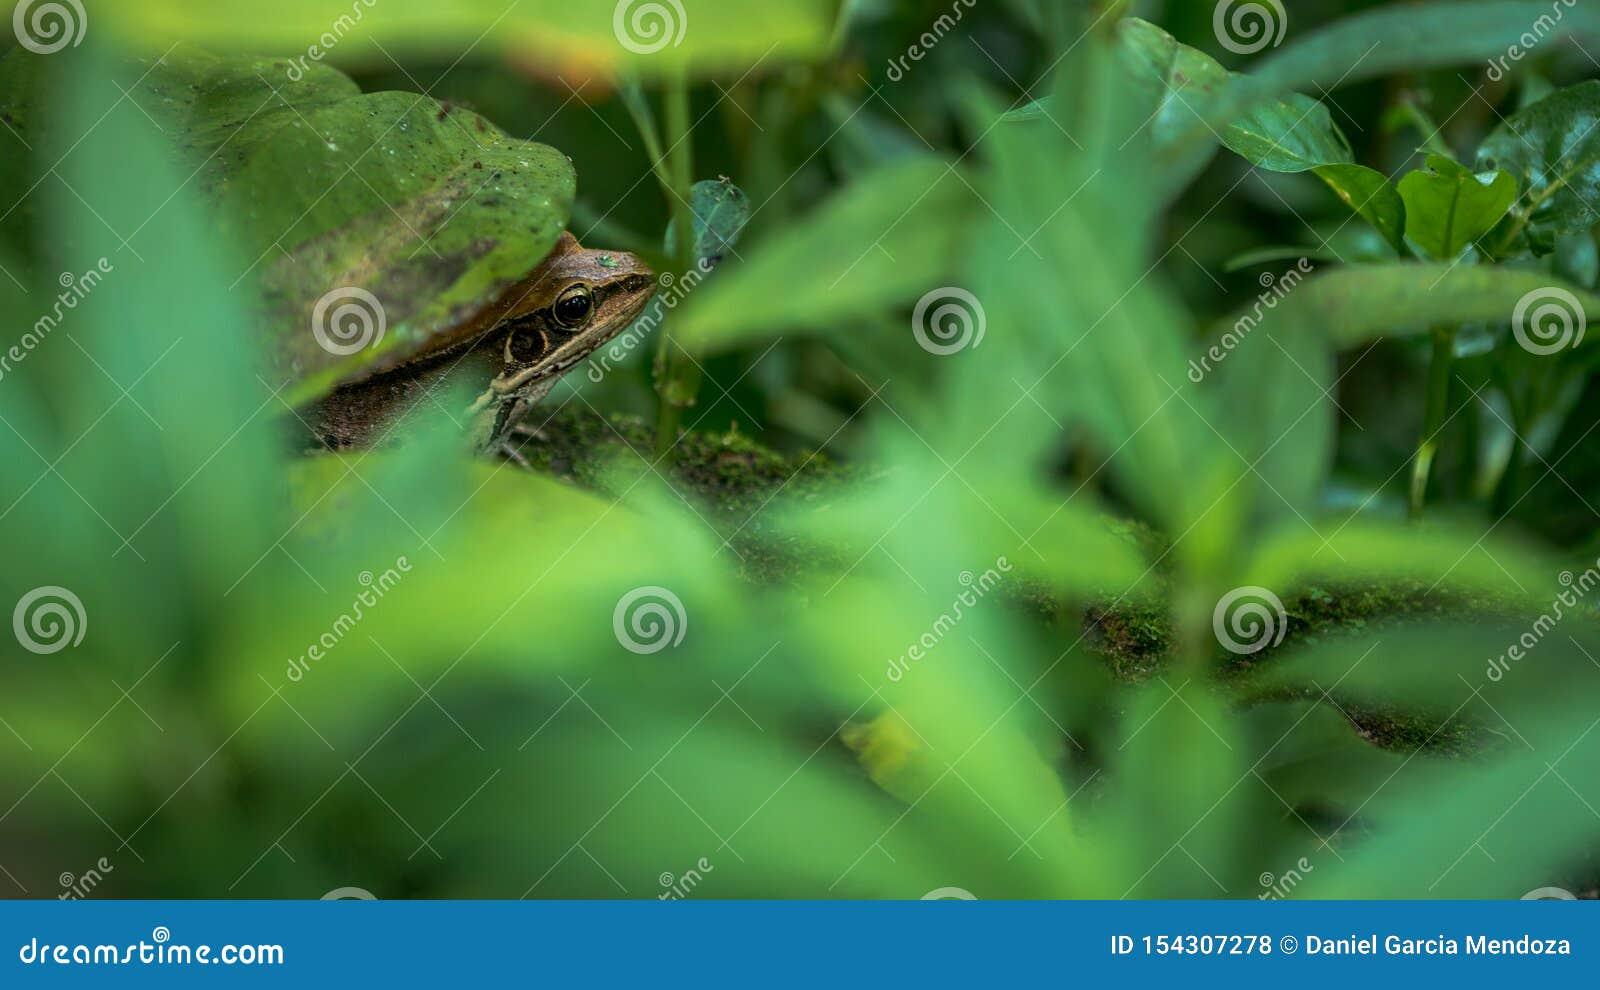 Close-up van volwassen kikkerrust op rand van vijver met groene plantaardige bladeren in Taiwan